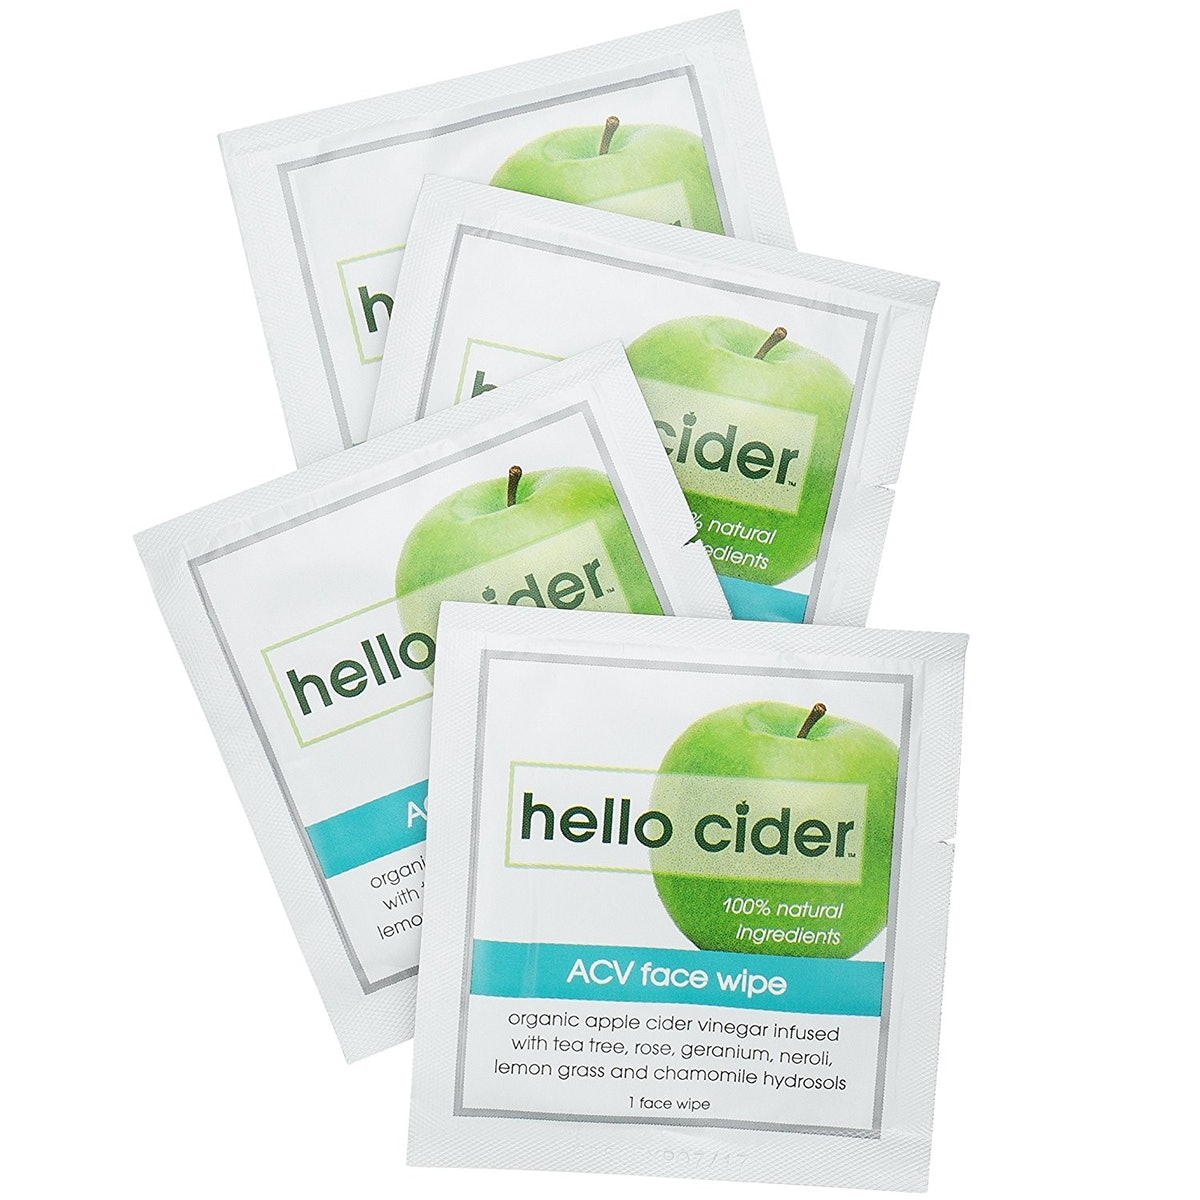 Hello Cider Organic Apple Cider Vinegar Face Wipes